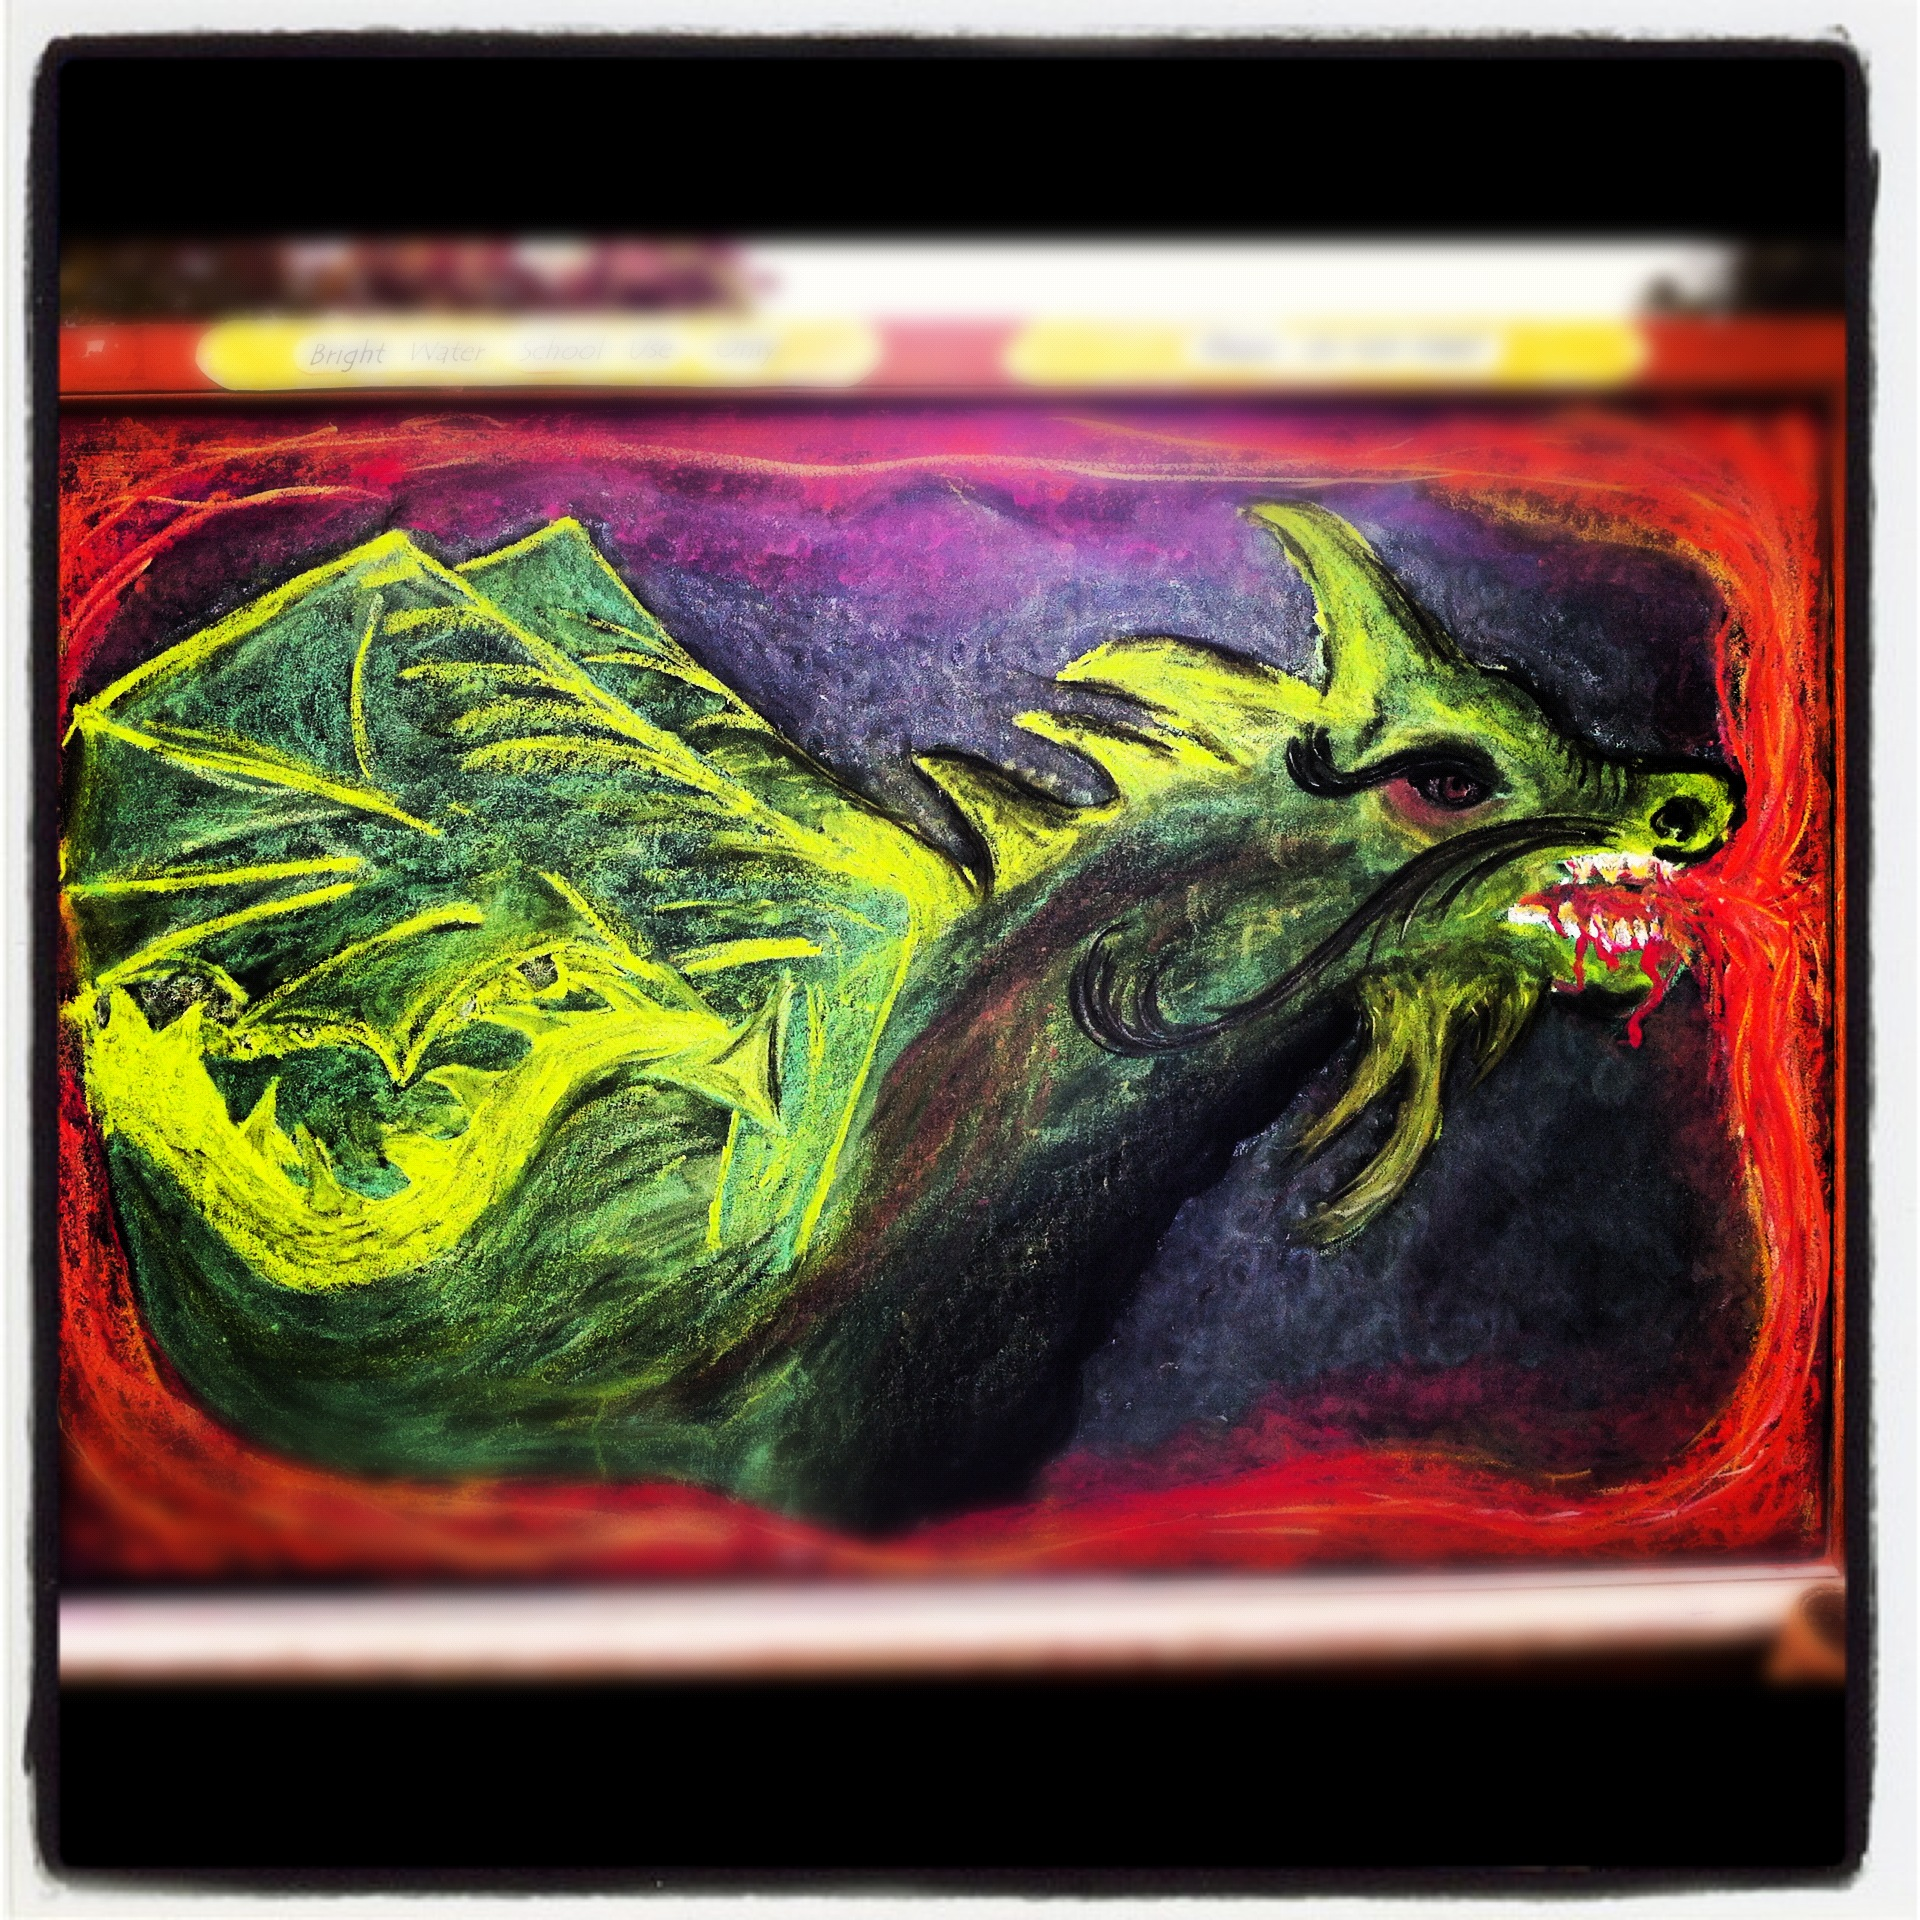 michaelmas chalkboard drawing, bright water waldorf school